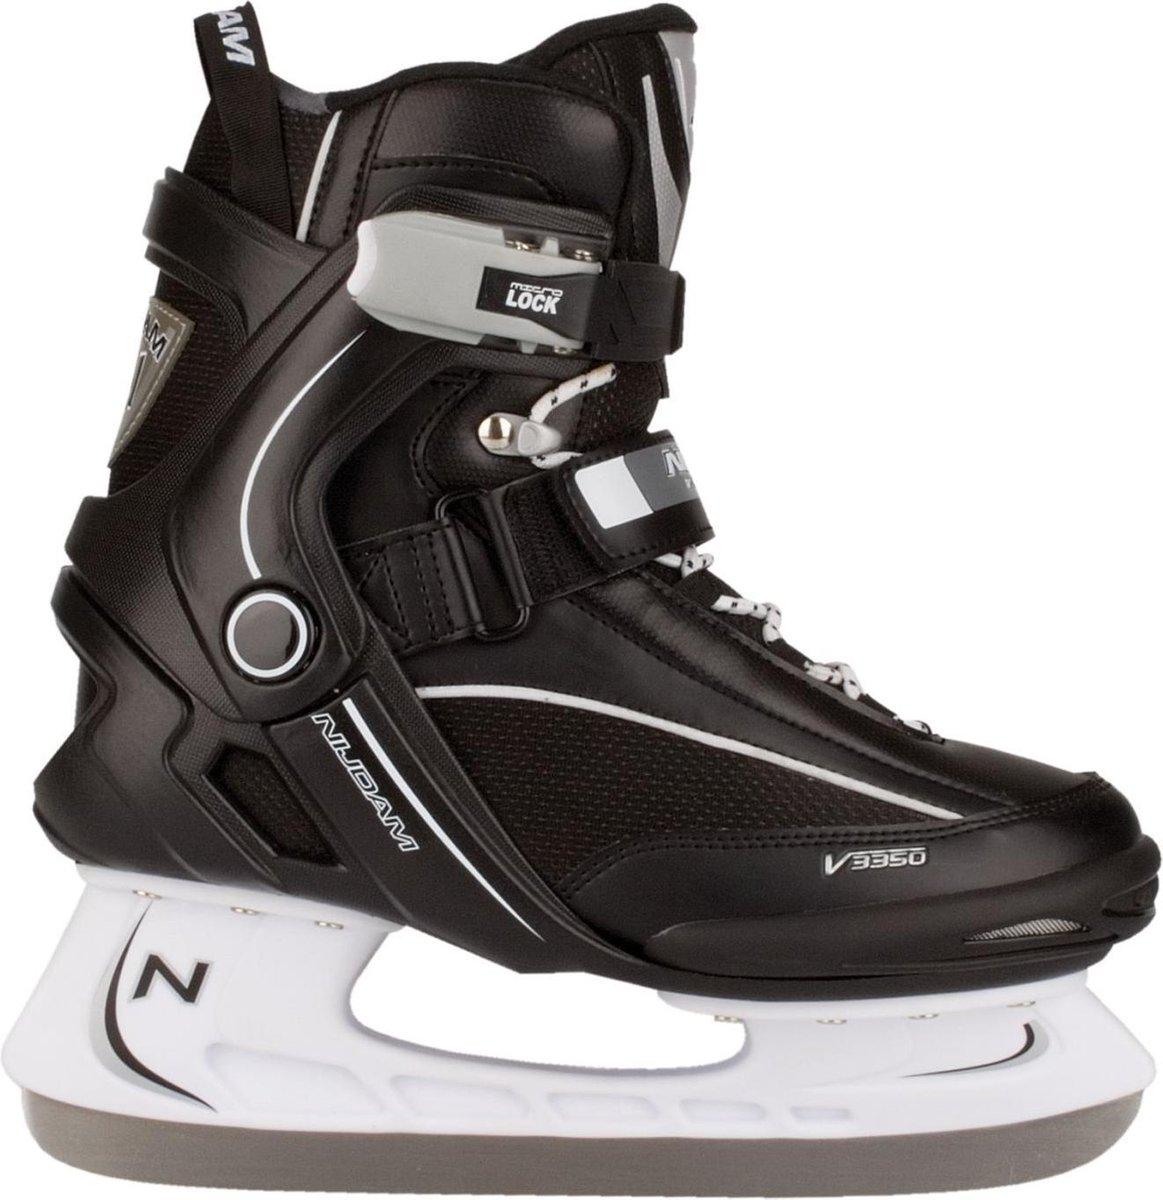 Nijdam IJshockeyschaats - Semi-Softboot - Zwart/Wit - Maat 46